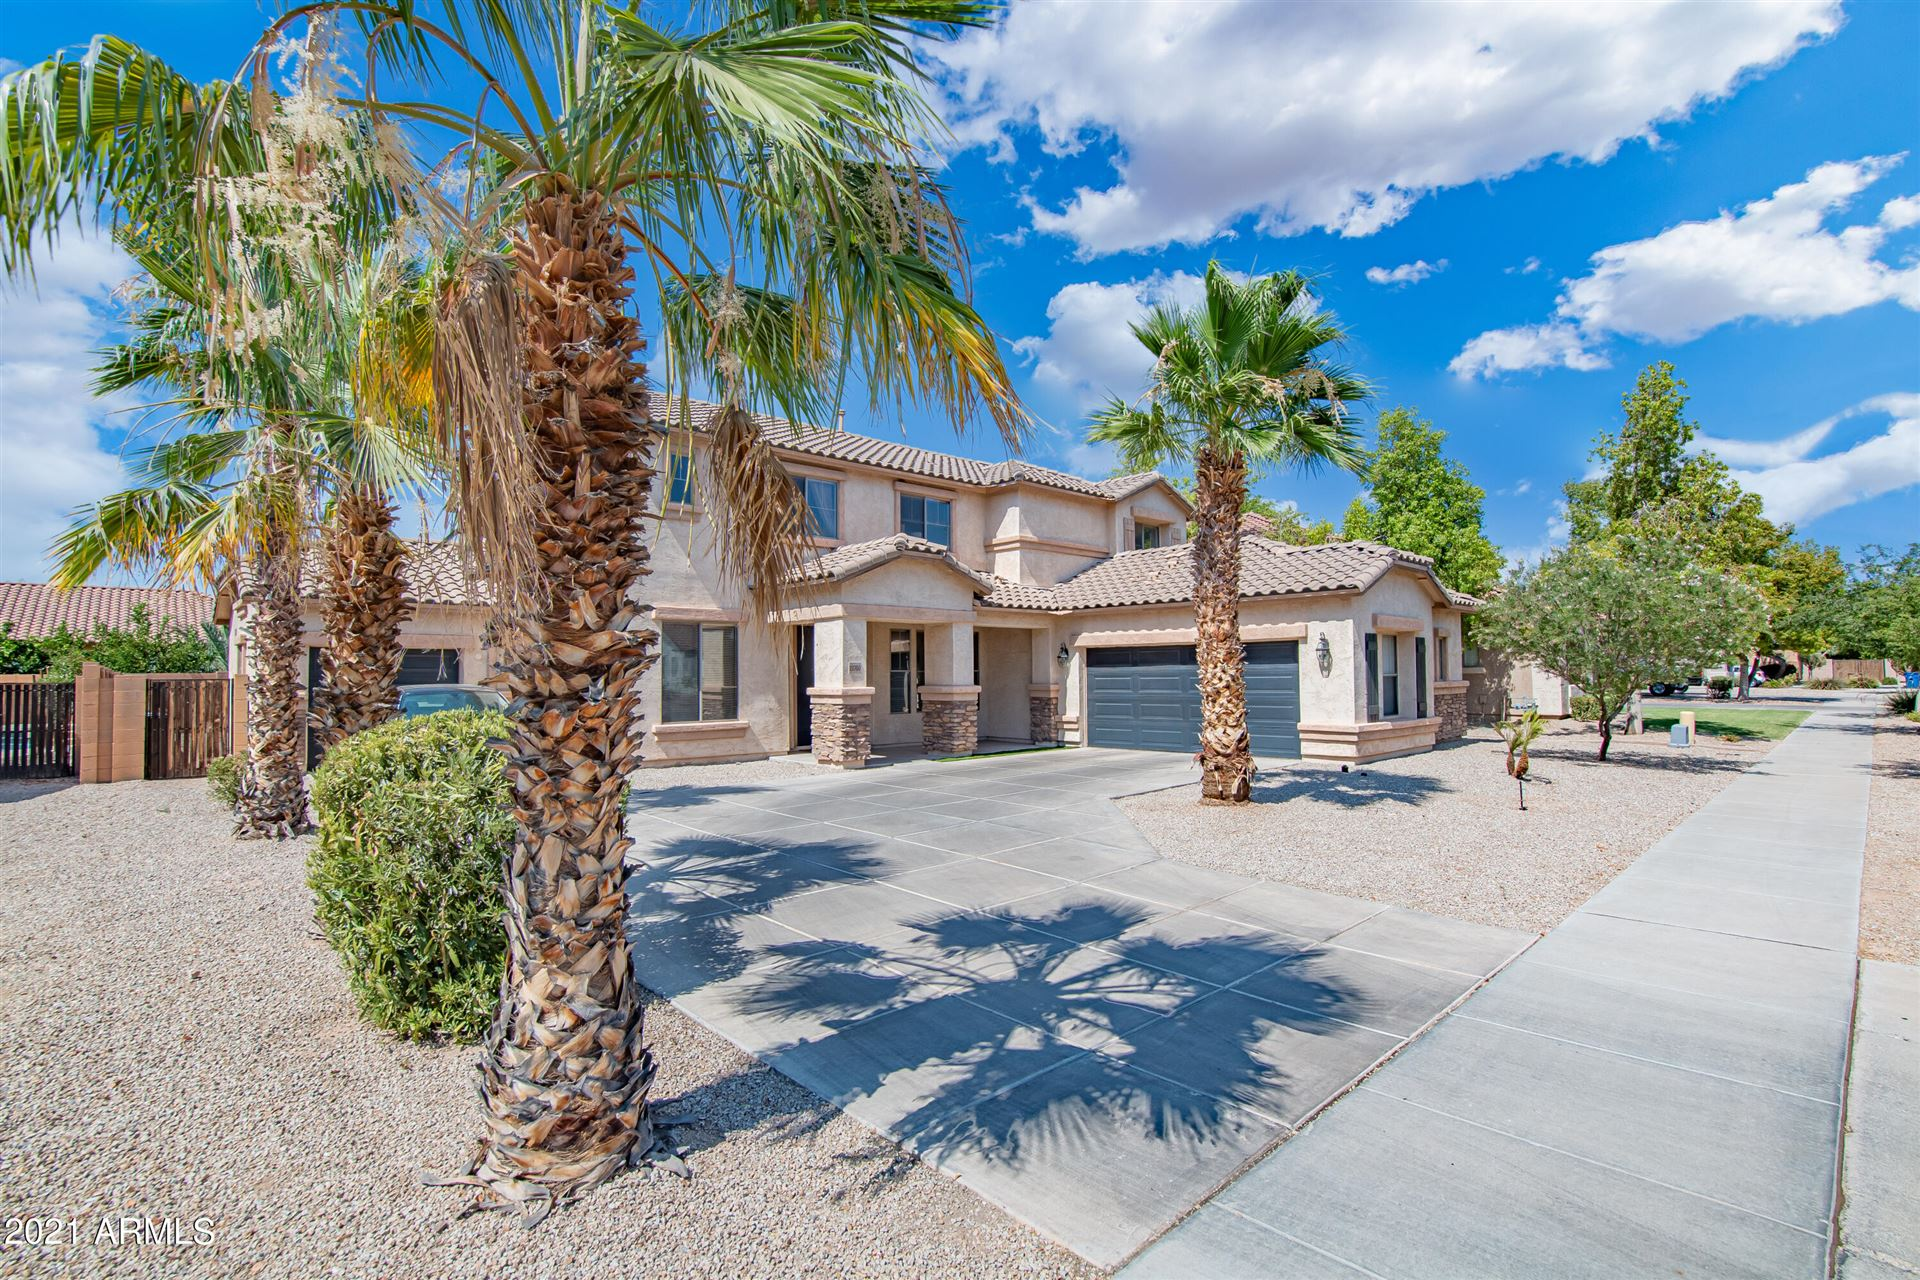 Photo of 19760 E MAYBERRY Road, Queen Creek, AZ 85142 (MLS # 6248870)